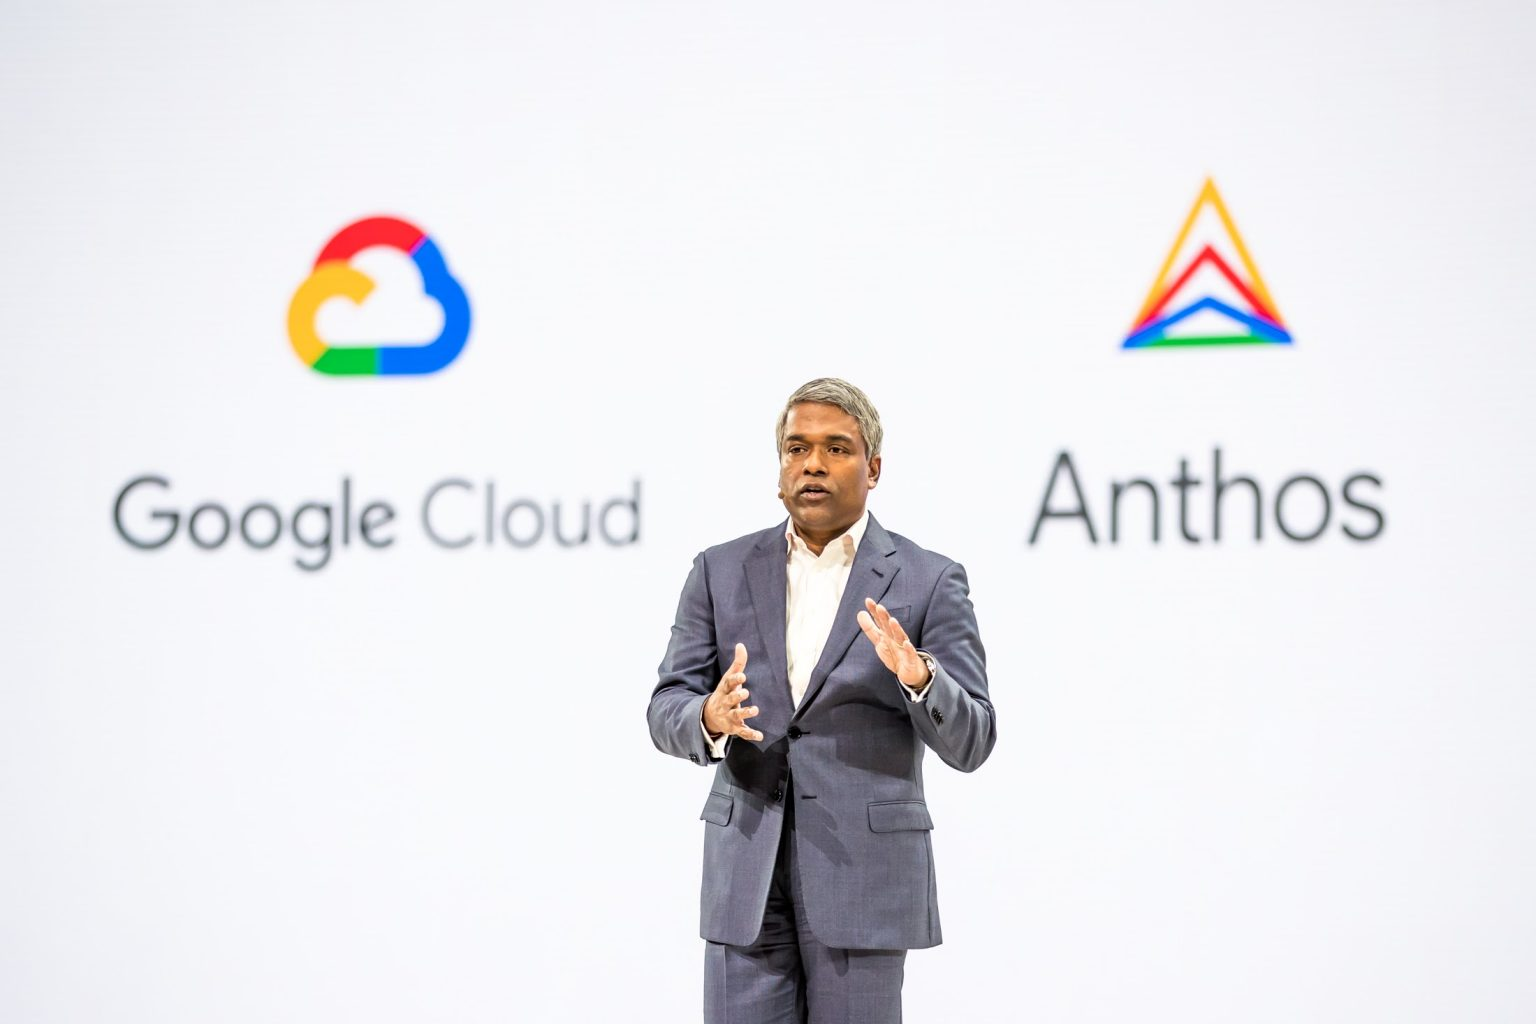 Google Cloud - Anthos